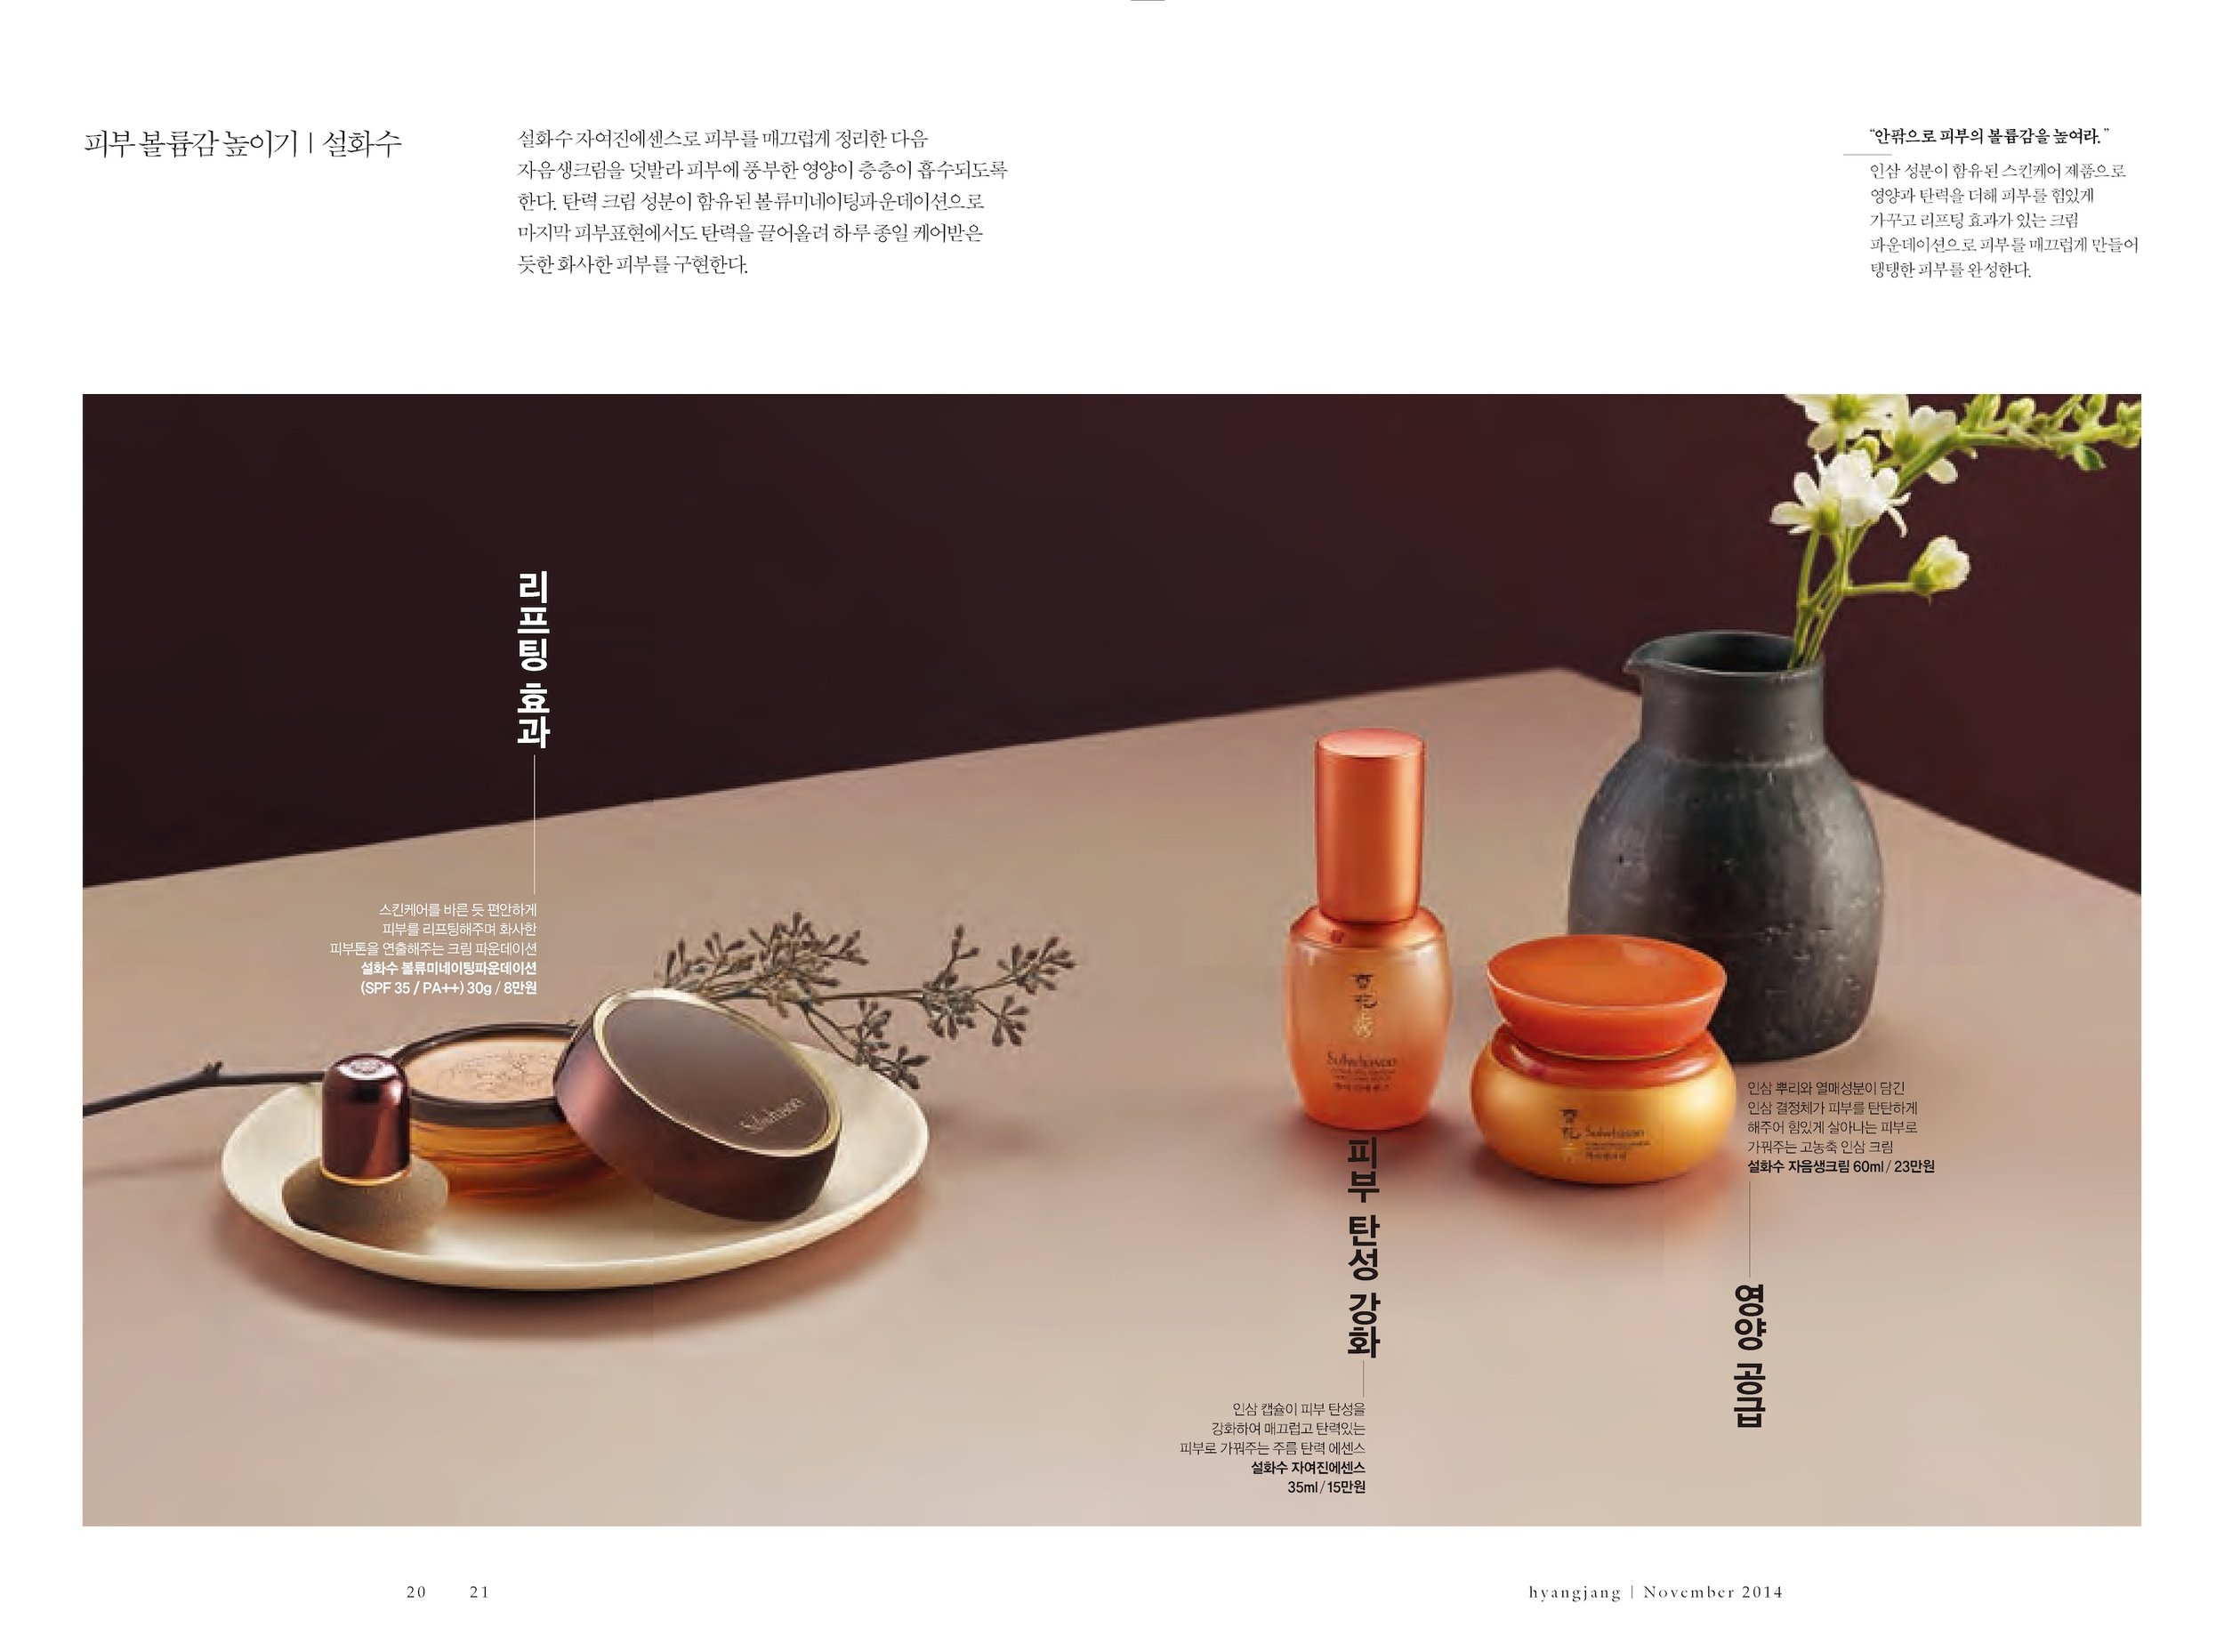 hyangjang-201411_페이지_11.jpeg